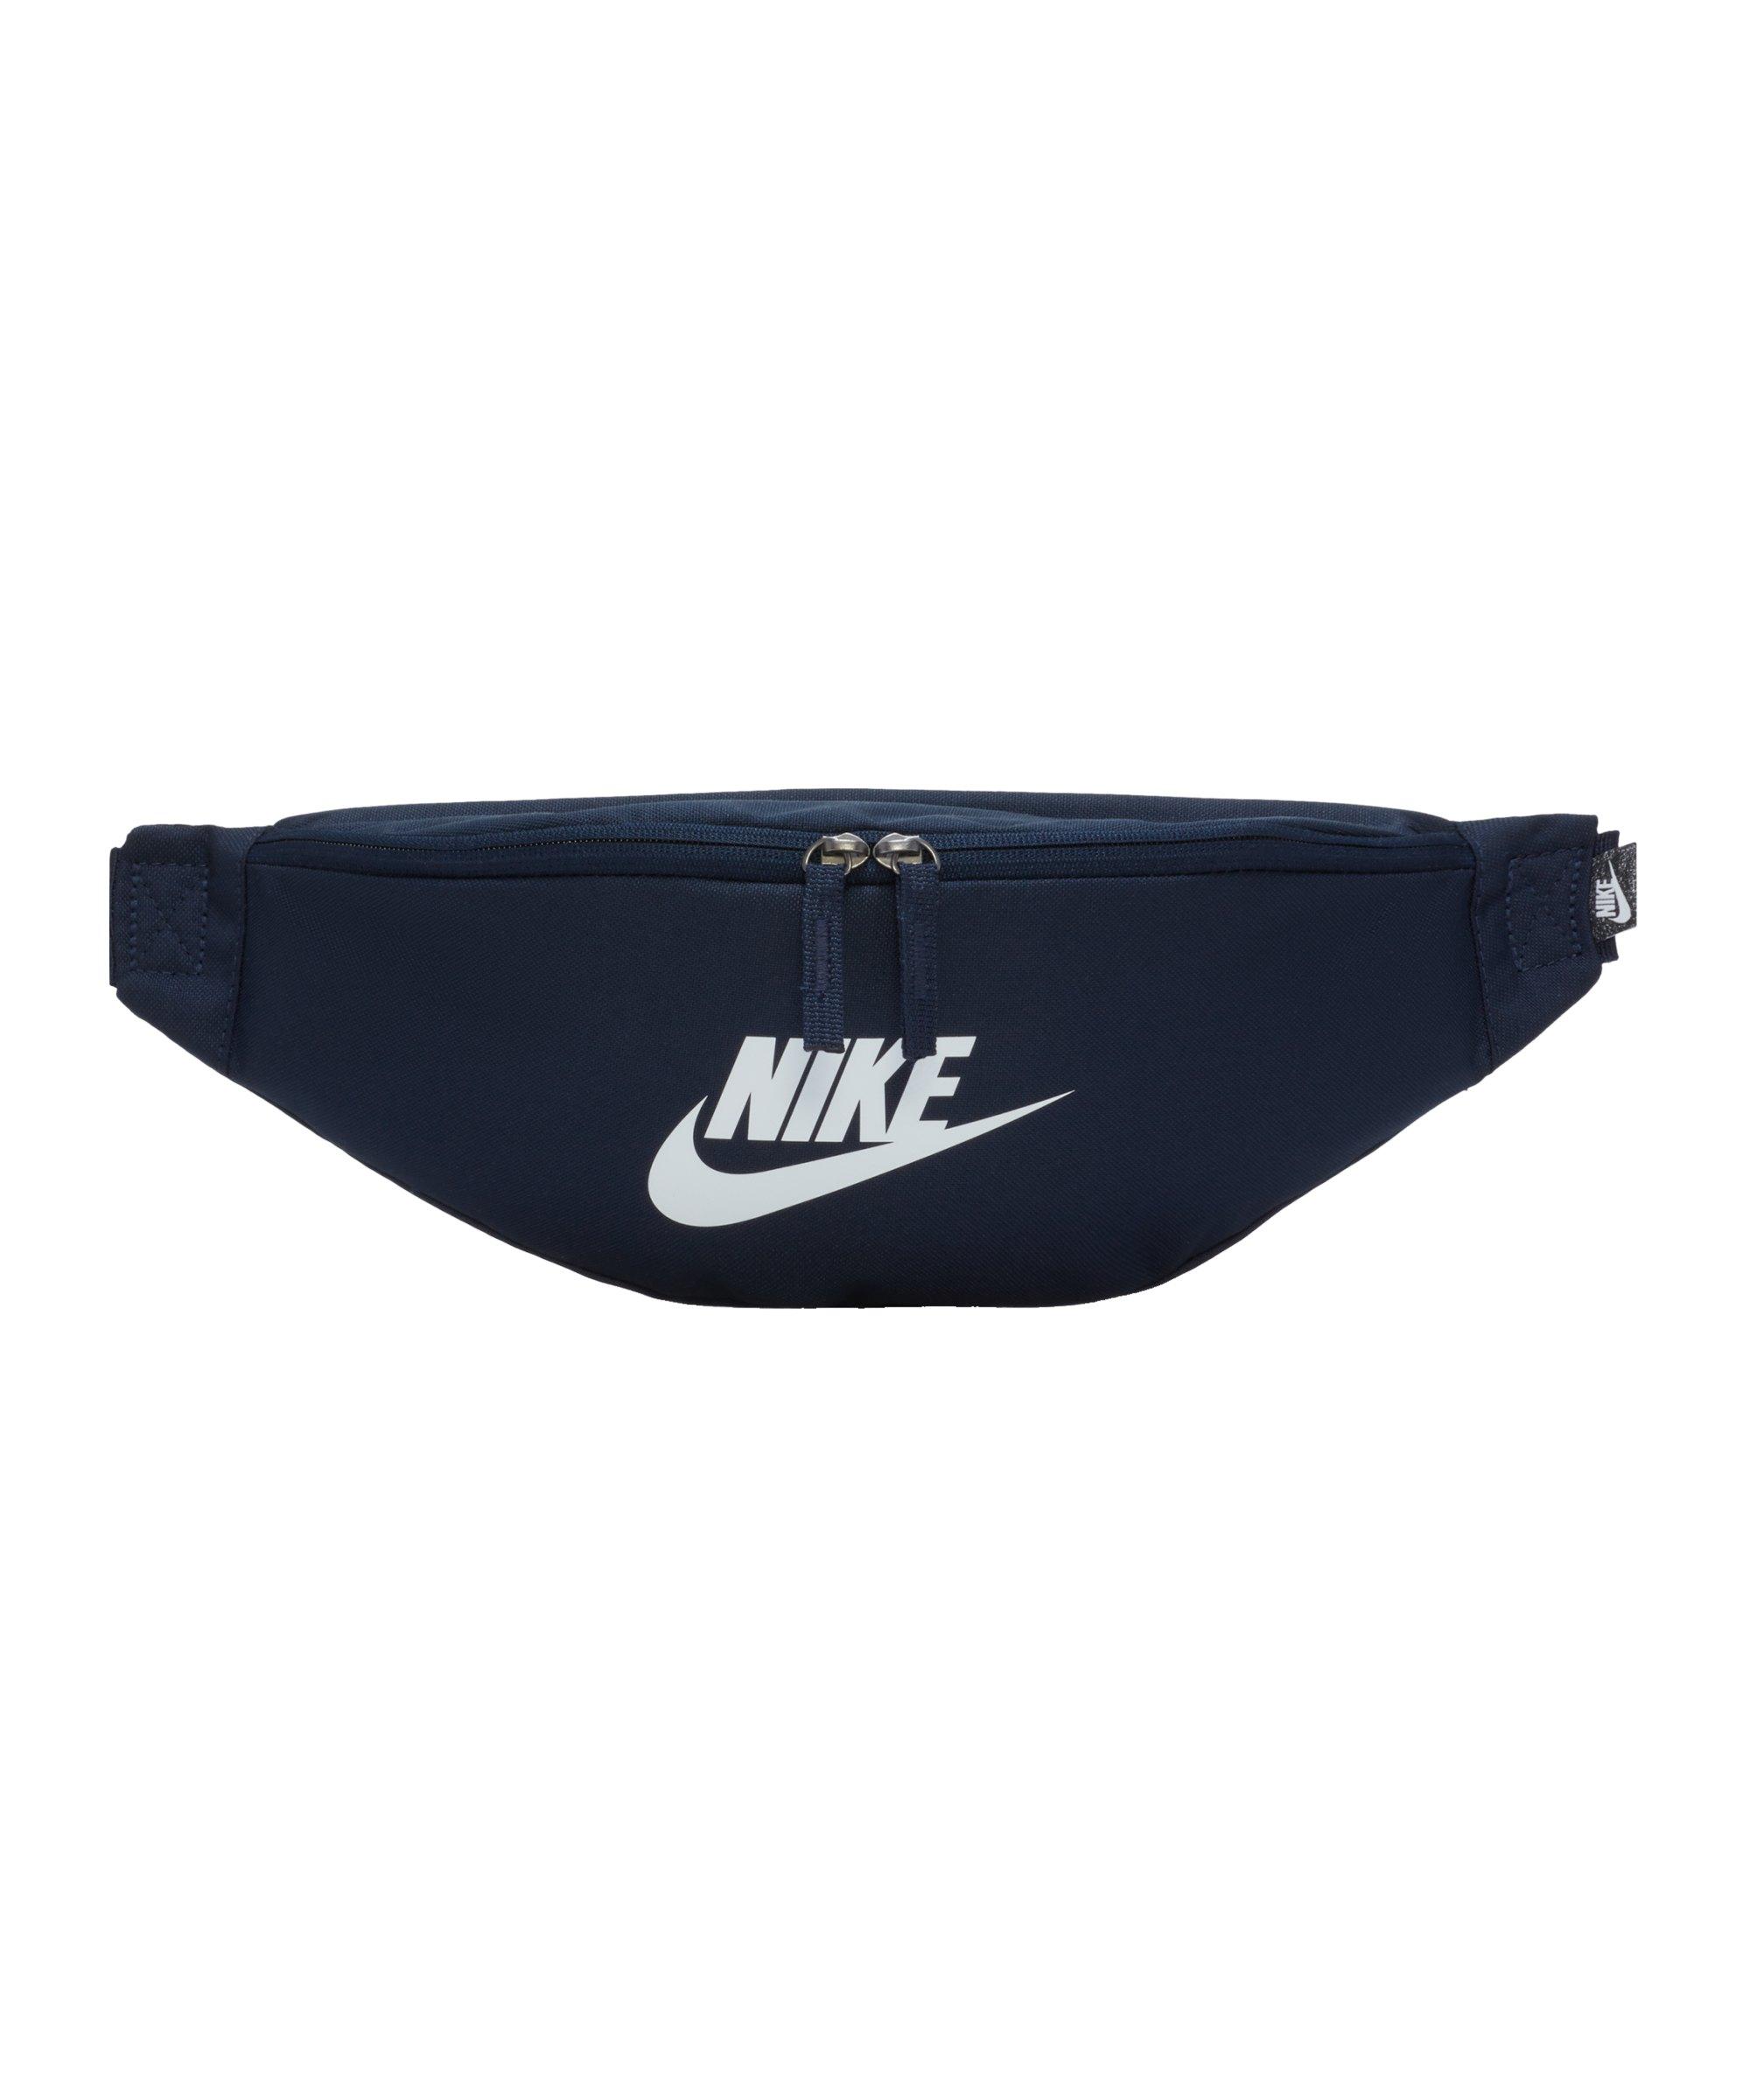 Nike Heritage Hüfttasche Blau Weiss F451 - blau